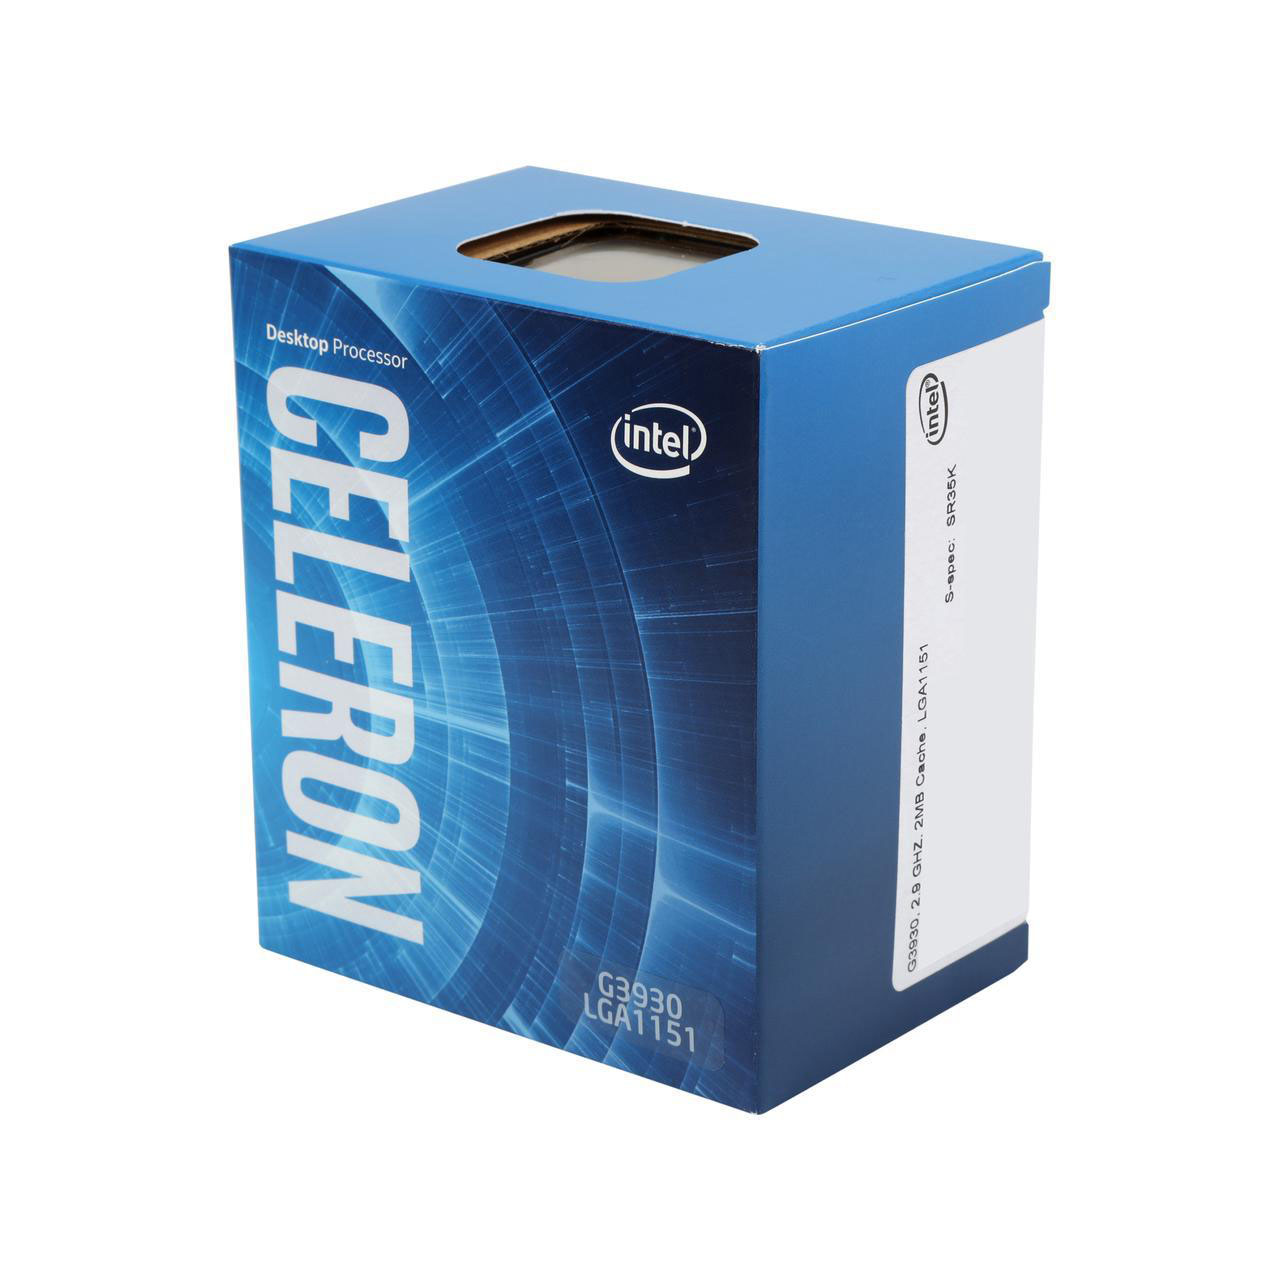 CPU_INTEL_CELERON_G3930_3.jpg